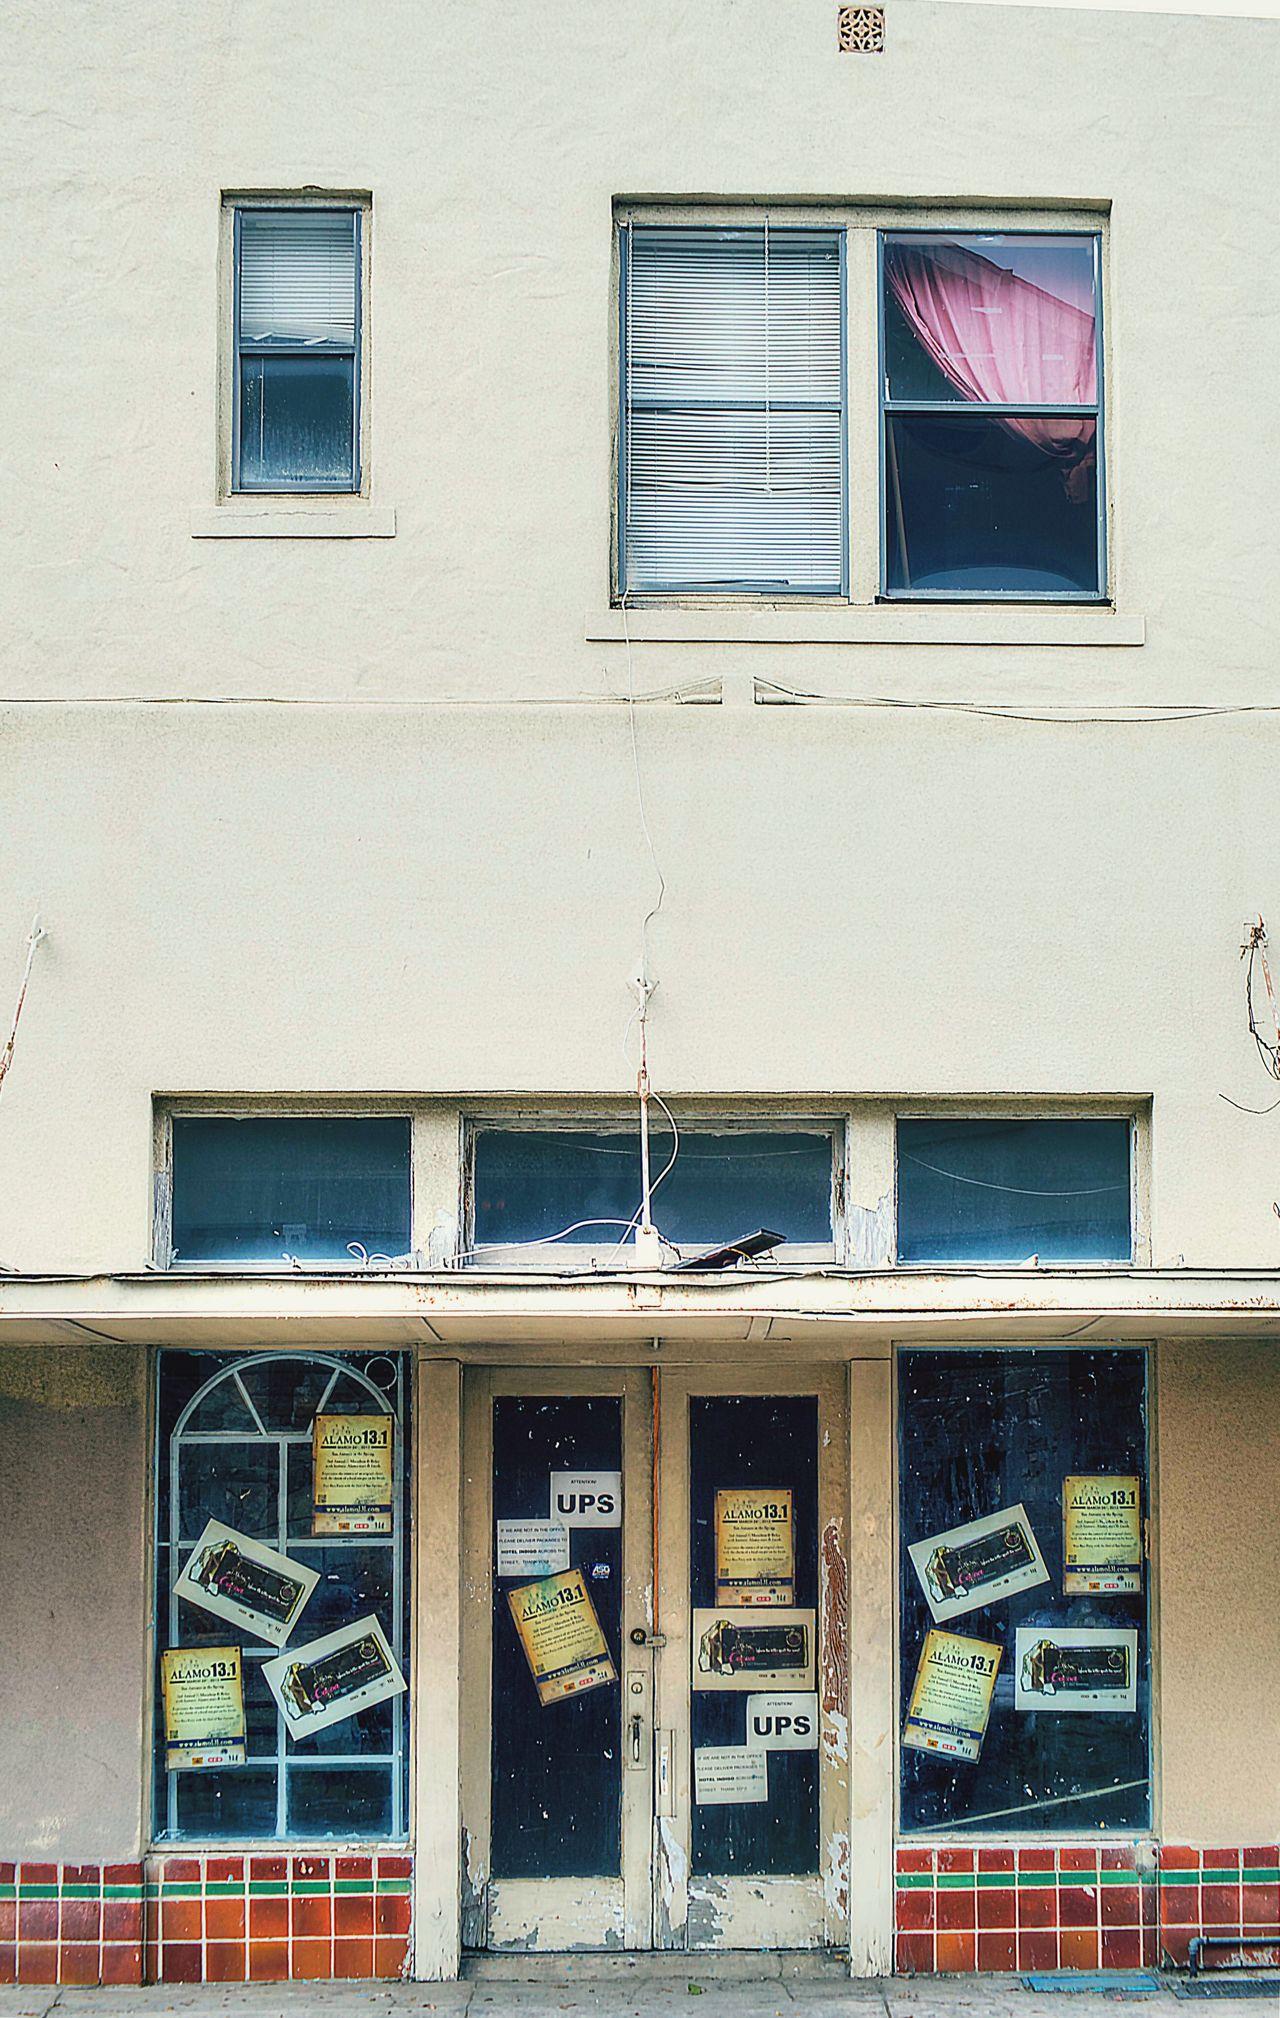 UPS Store San Antonio, Texas Architecture The Architect - 2016 EyeEm Awards Fine Art Photography EyeEmGalley Urbanphotography Architectural Detail Store Door